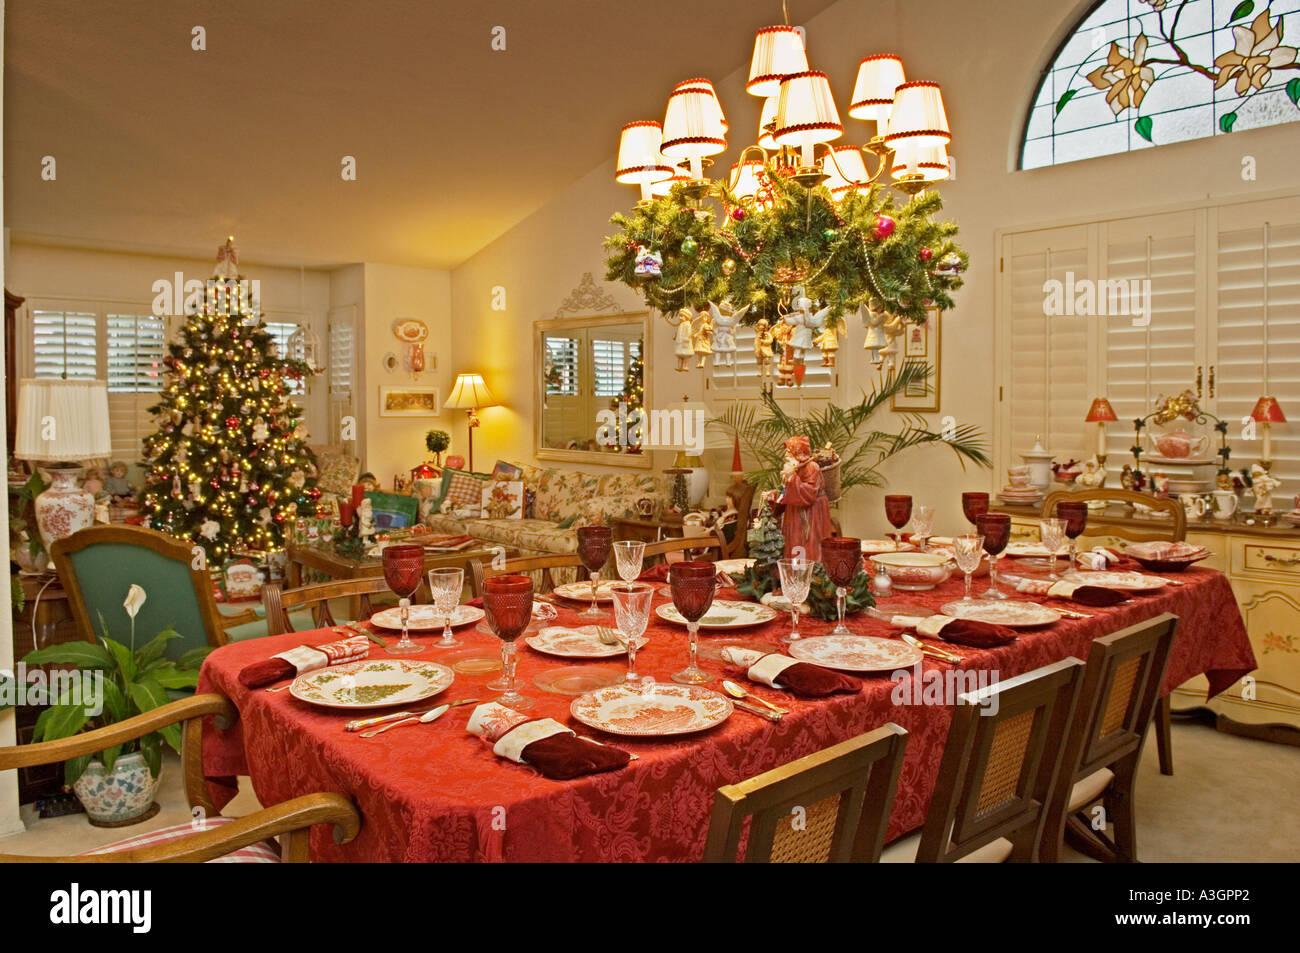 Dining Room Table Set For Christmas Dinner In Living Room